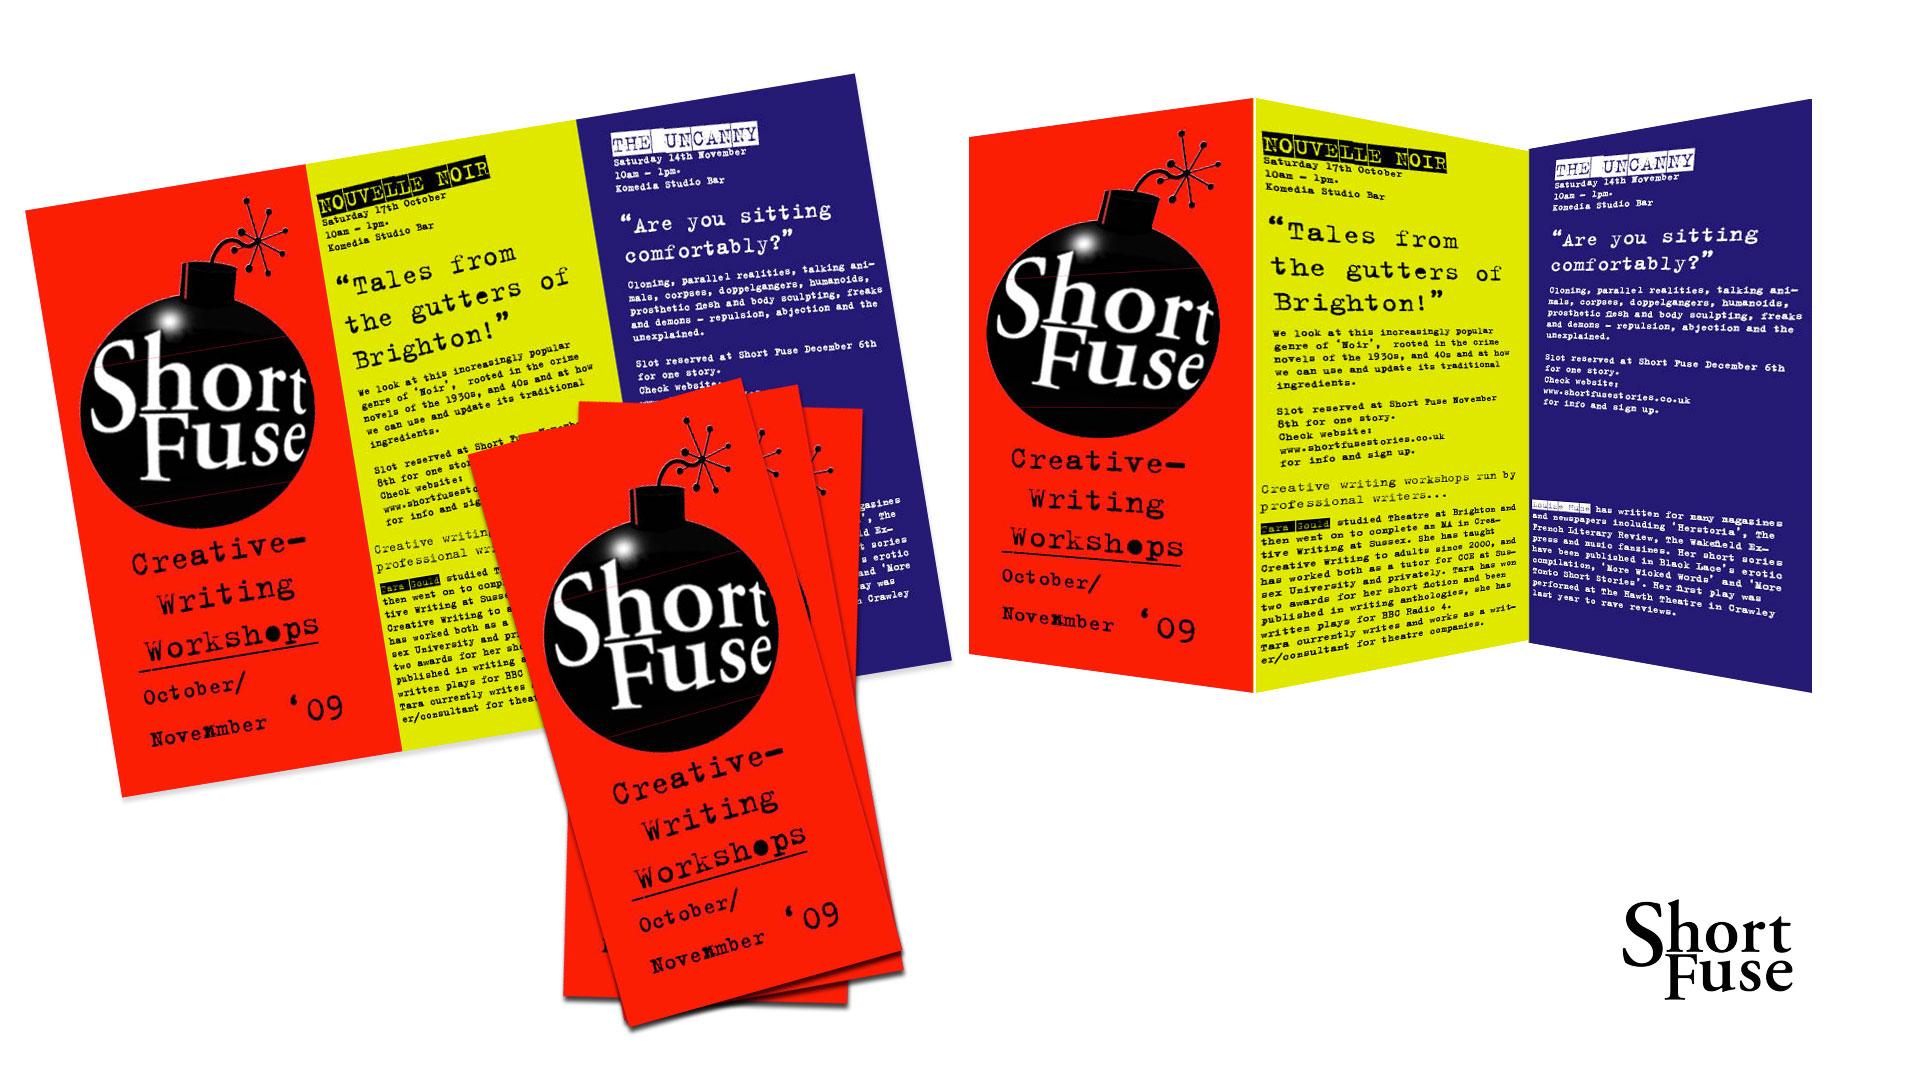 Short Fuse 3 fold